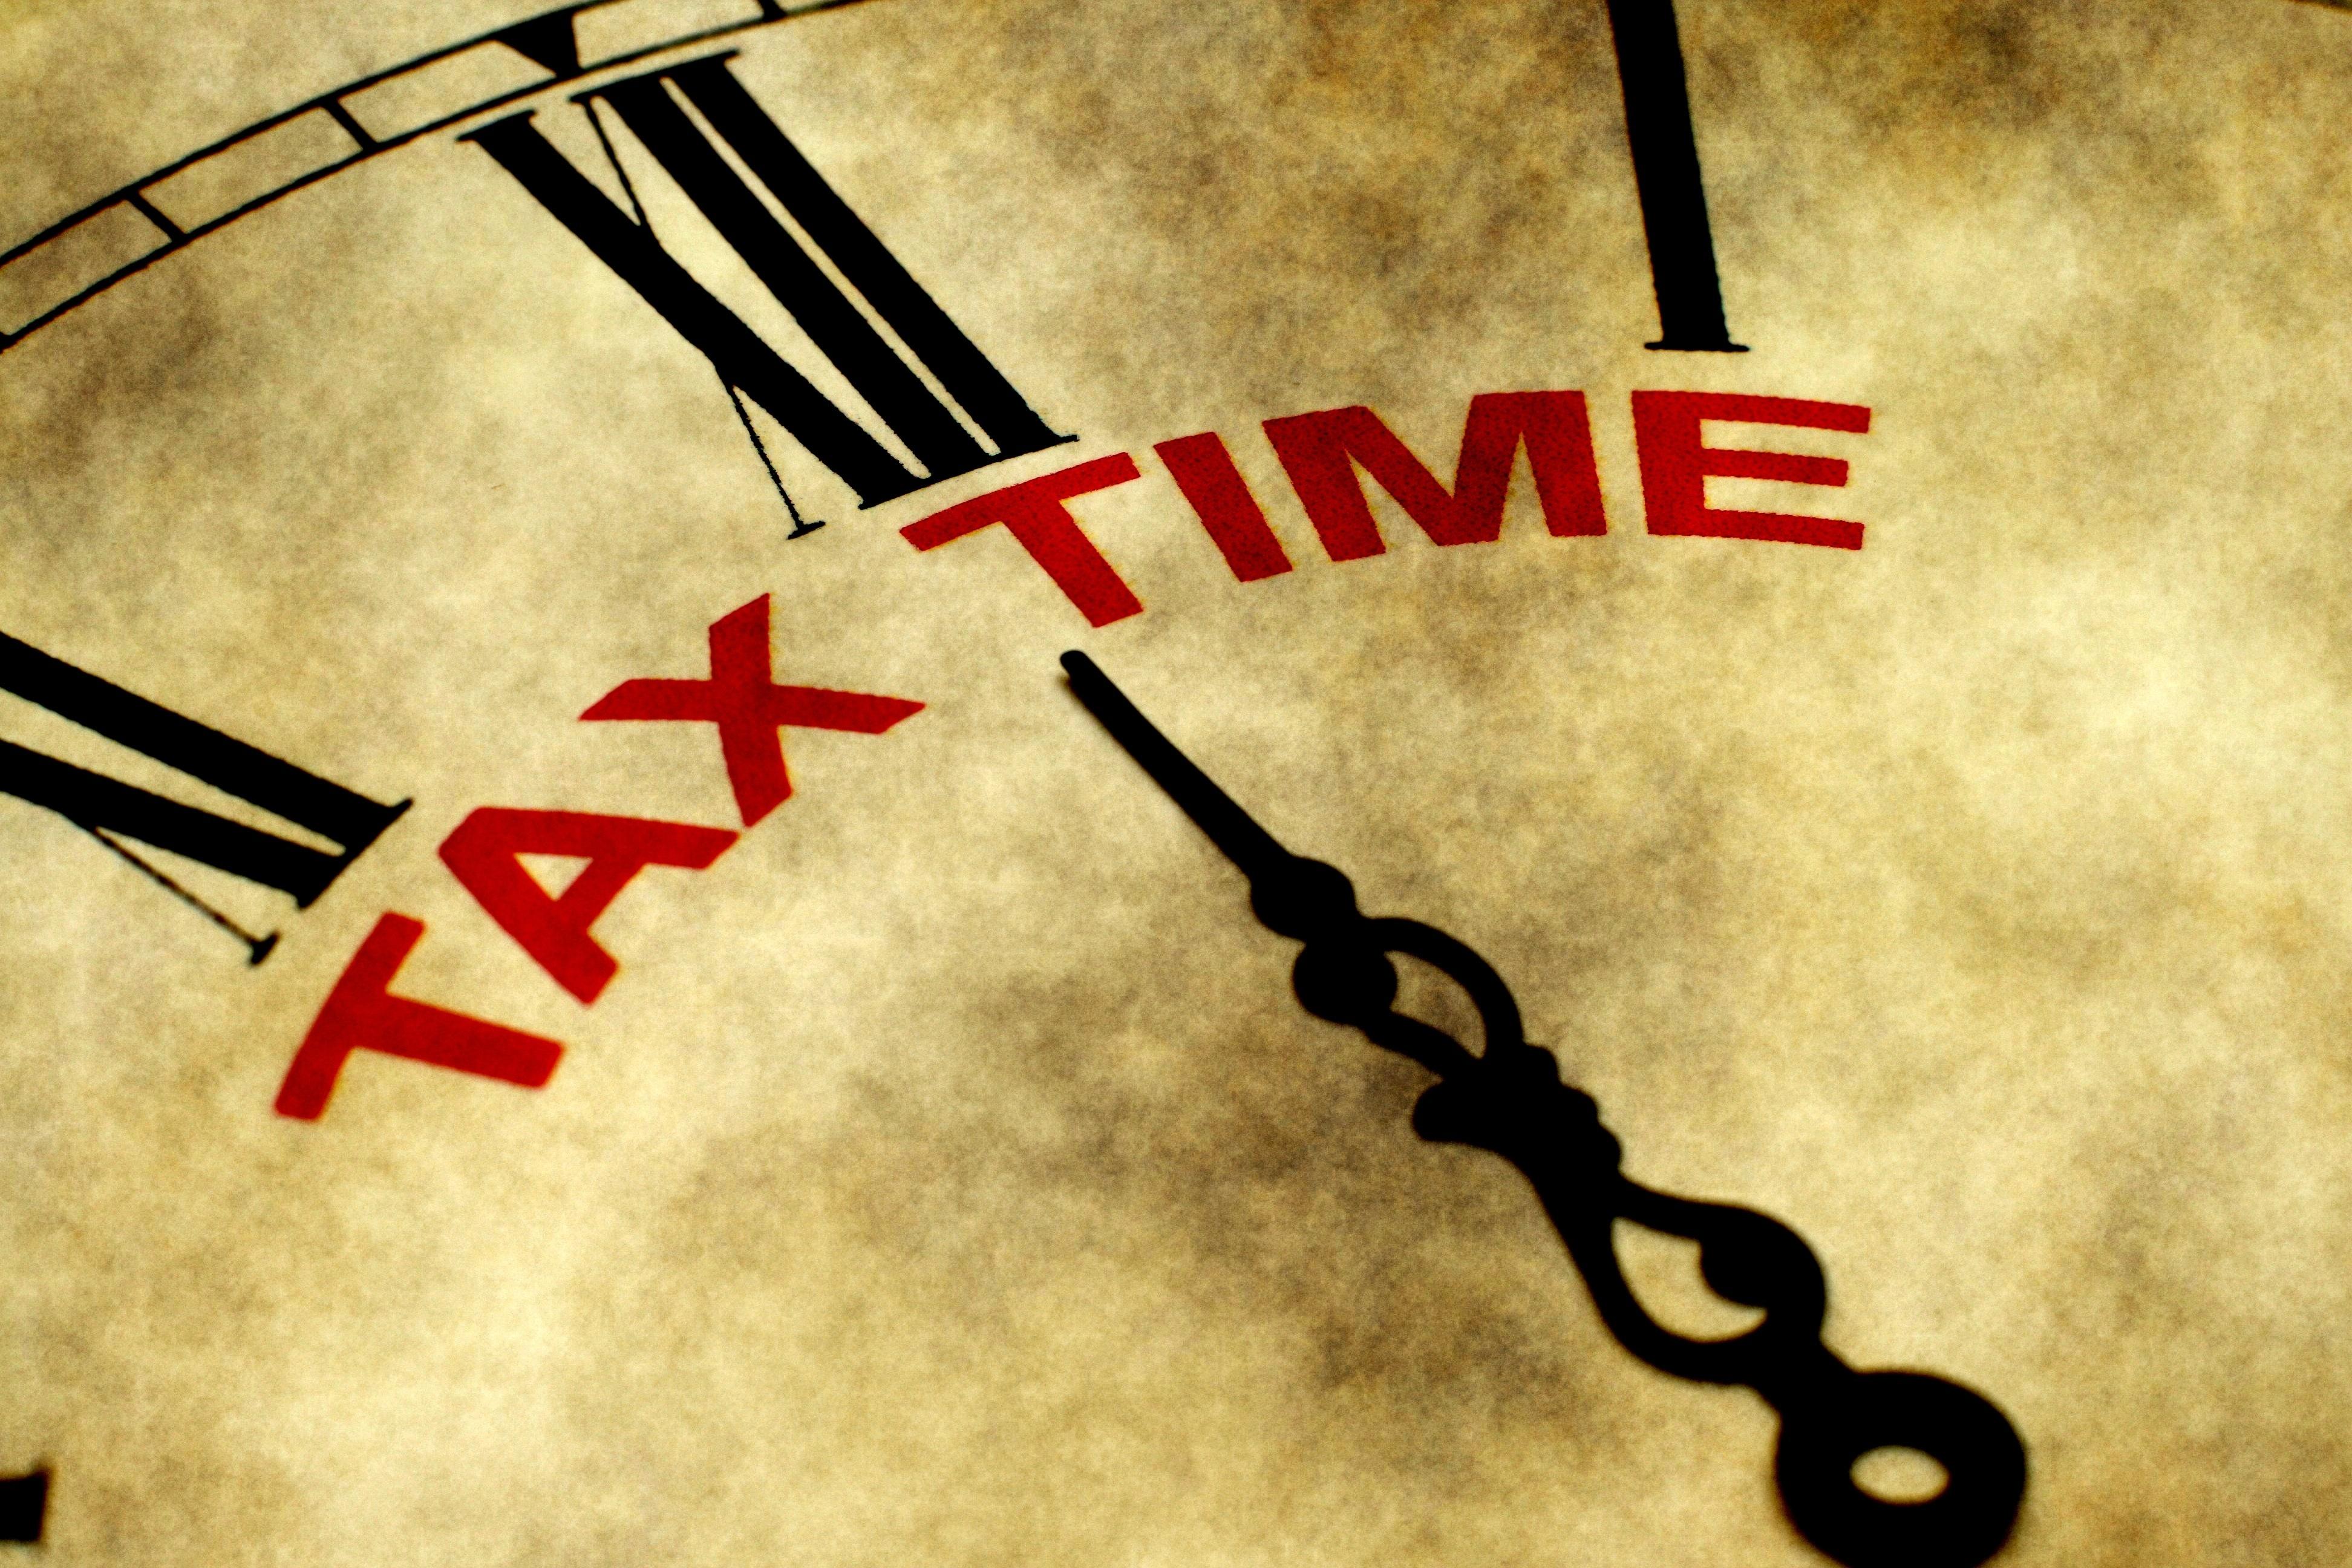 EY: Αυξημένος ο φορολογικός κίνδυνος για τις επιχειρήσεις παγκοσμίως, το 2021 και μετέπειτα